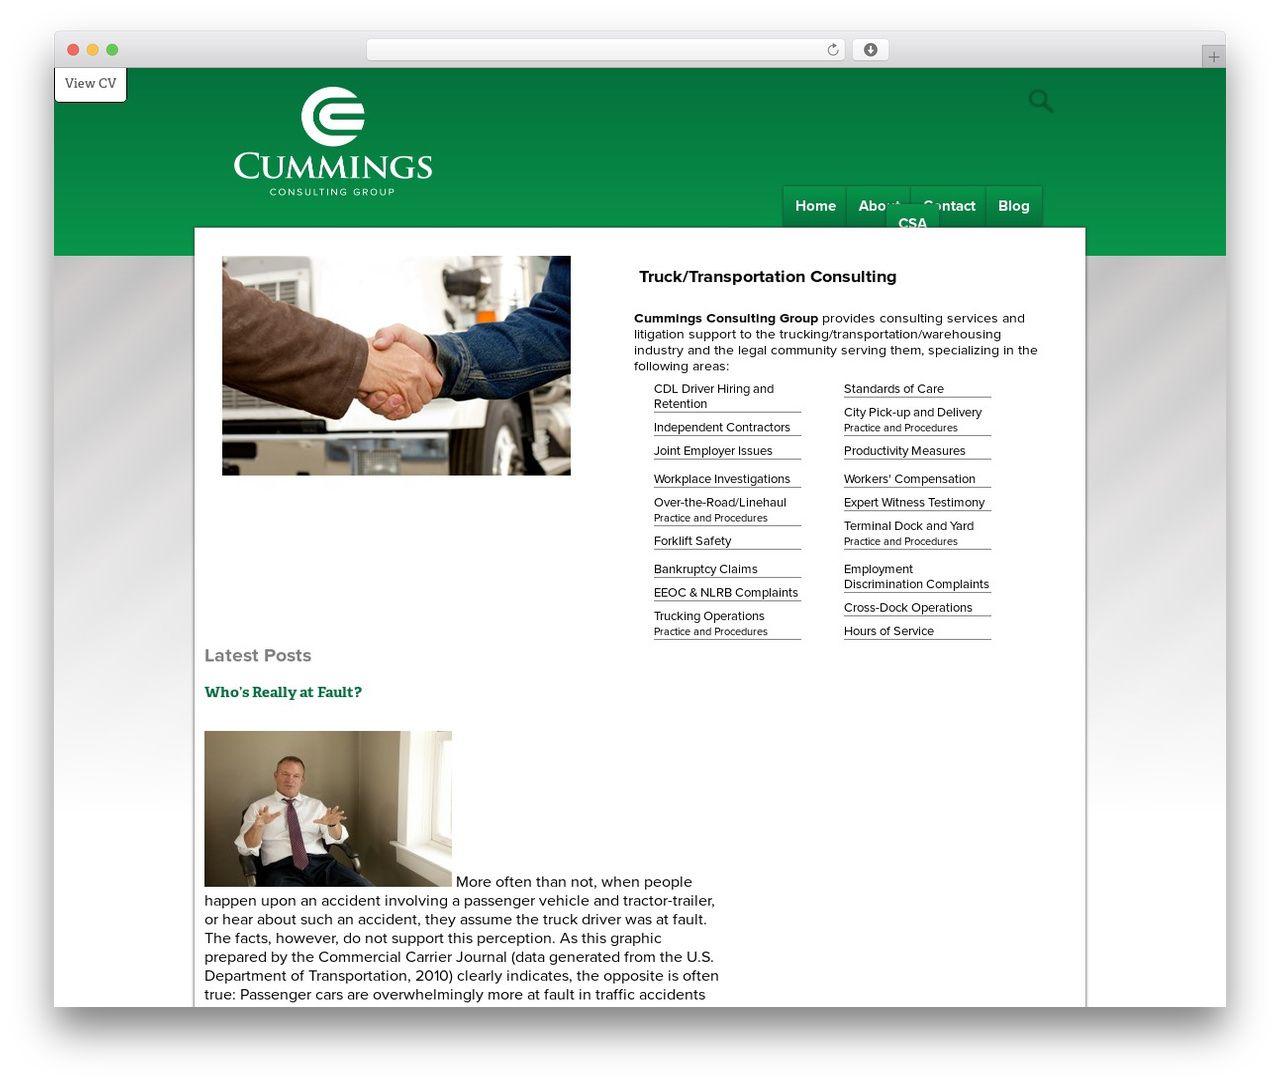 Html5 Blank Wordpress Page Templatetodd Motto Regarding Html5 Blank Page Template Best Template Ideas Page Template Professional Templates Best Templates